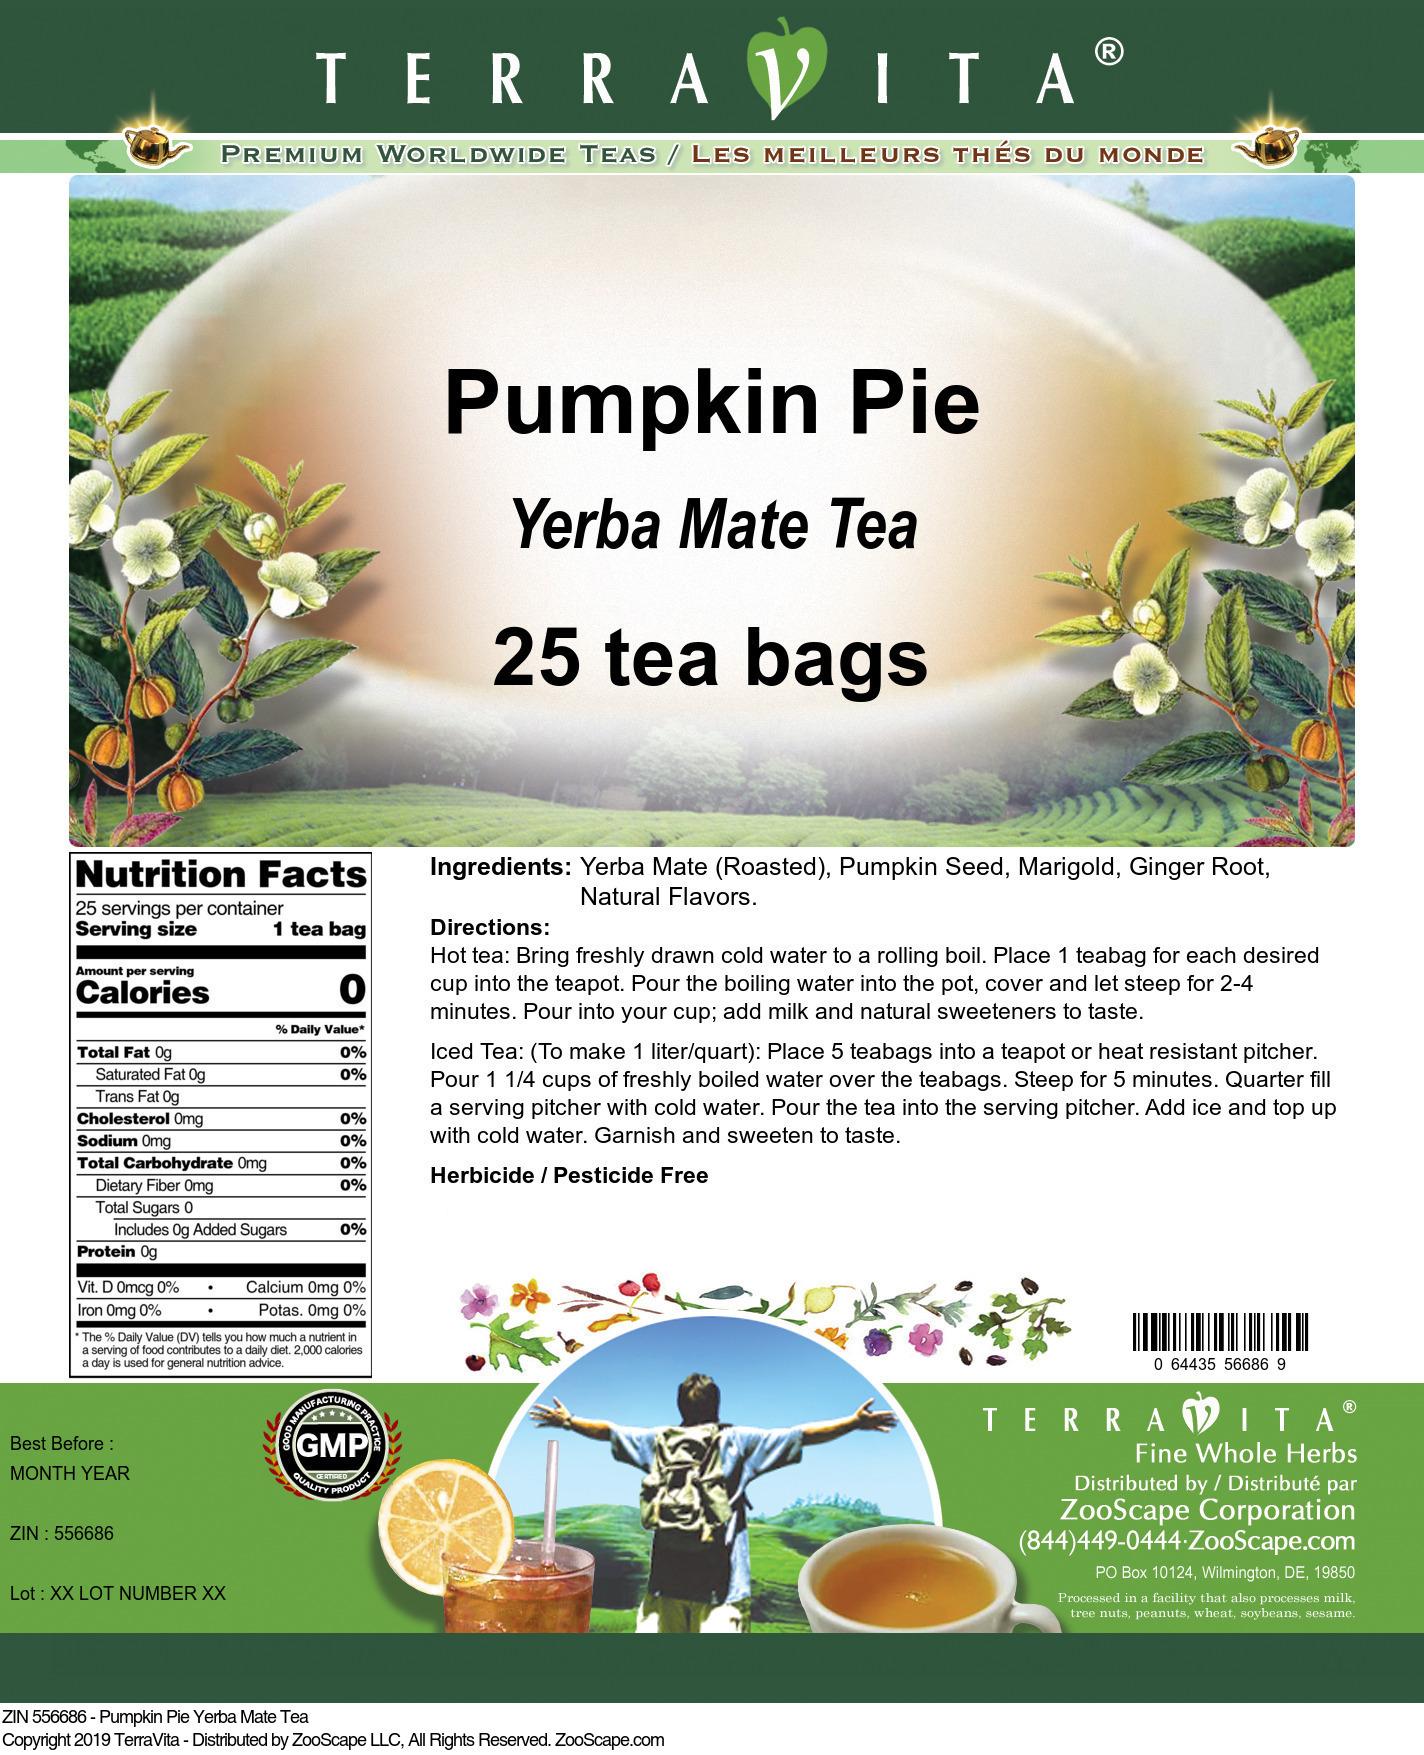 Pumpkin Pie Yerba Mate Tea